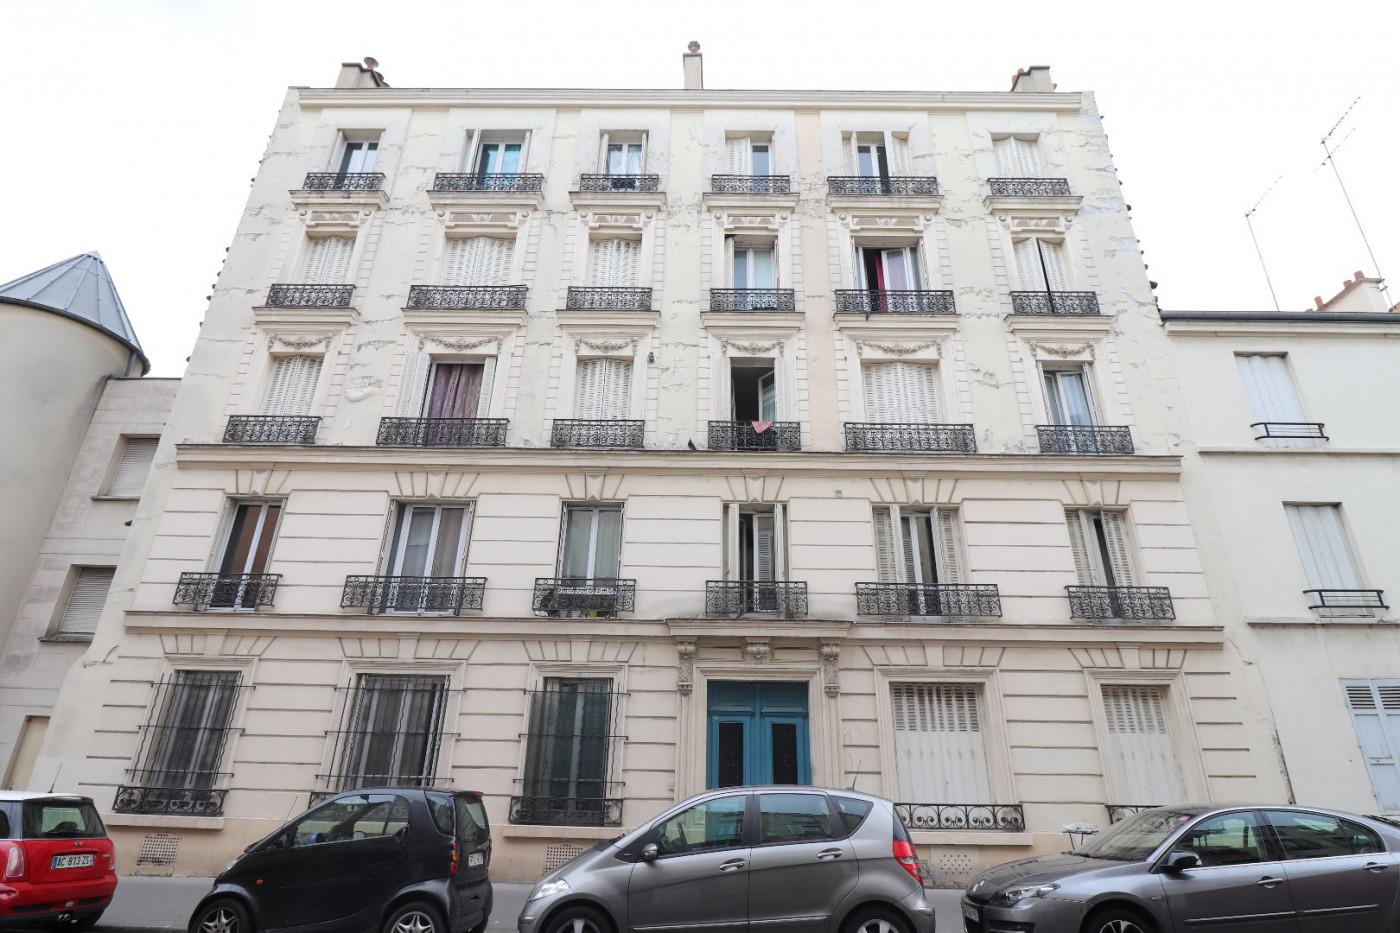 A vendre  Pantin | Réf 93005162 - Grand paris immo transaction